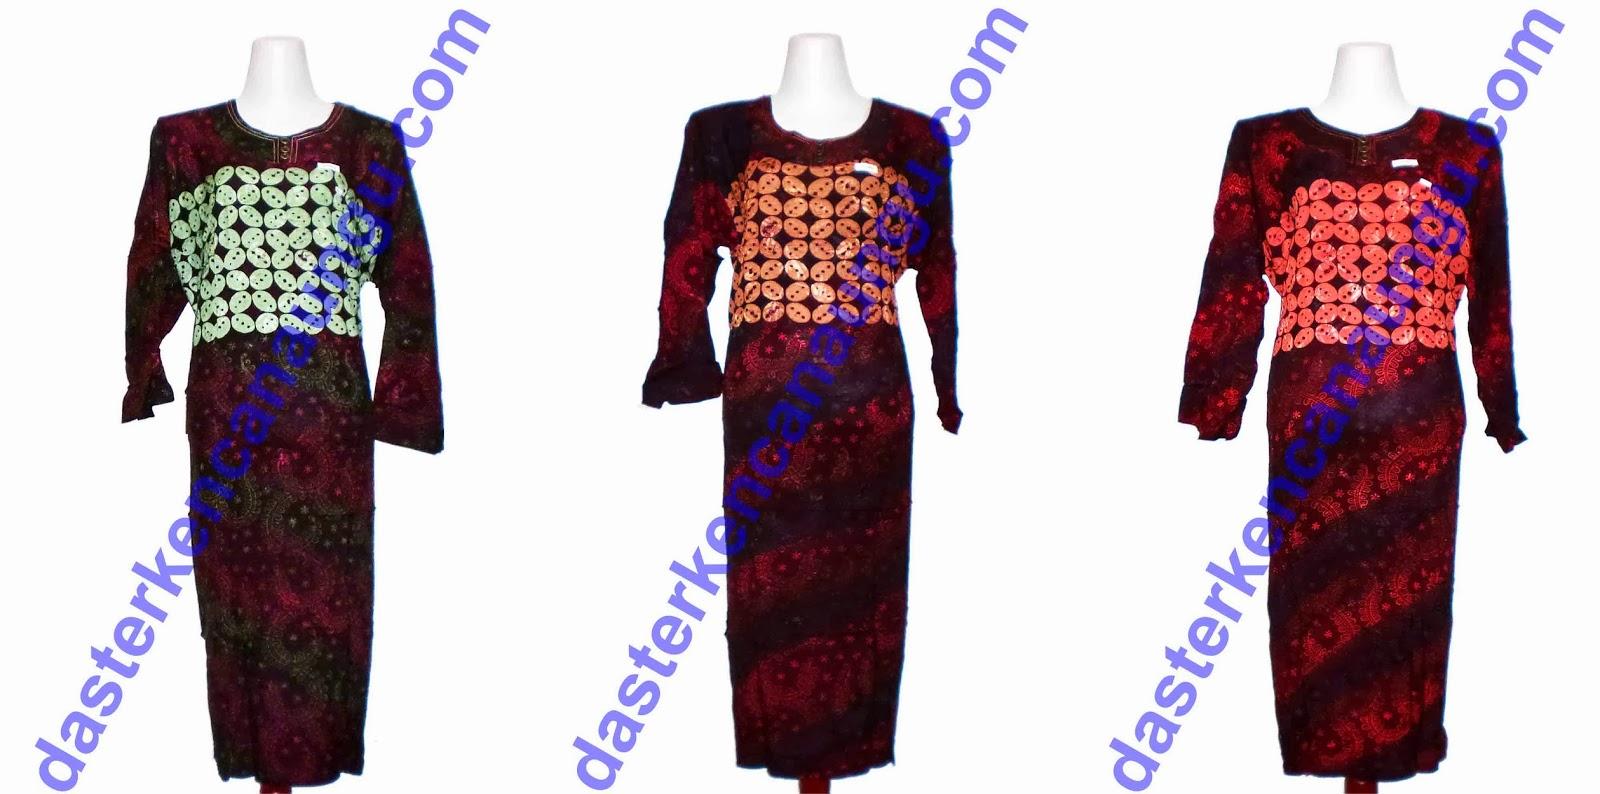 Jual Daster Kencana Ungu Online Batik Ldh Doby Jumbo Label Biru